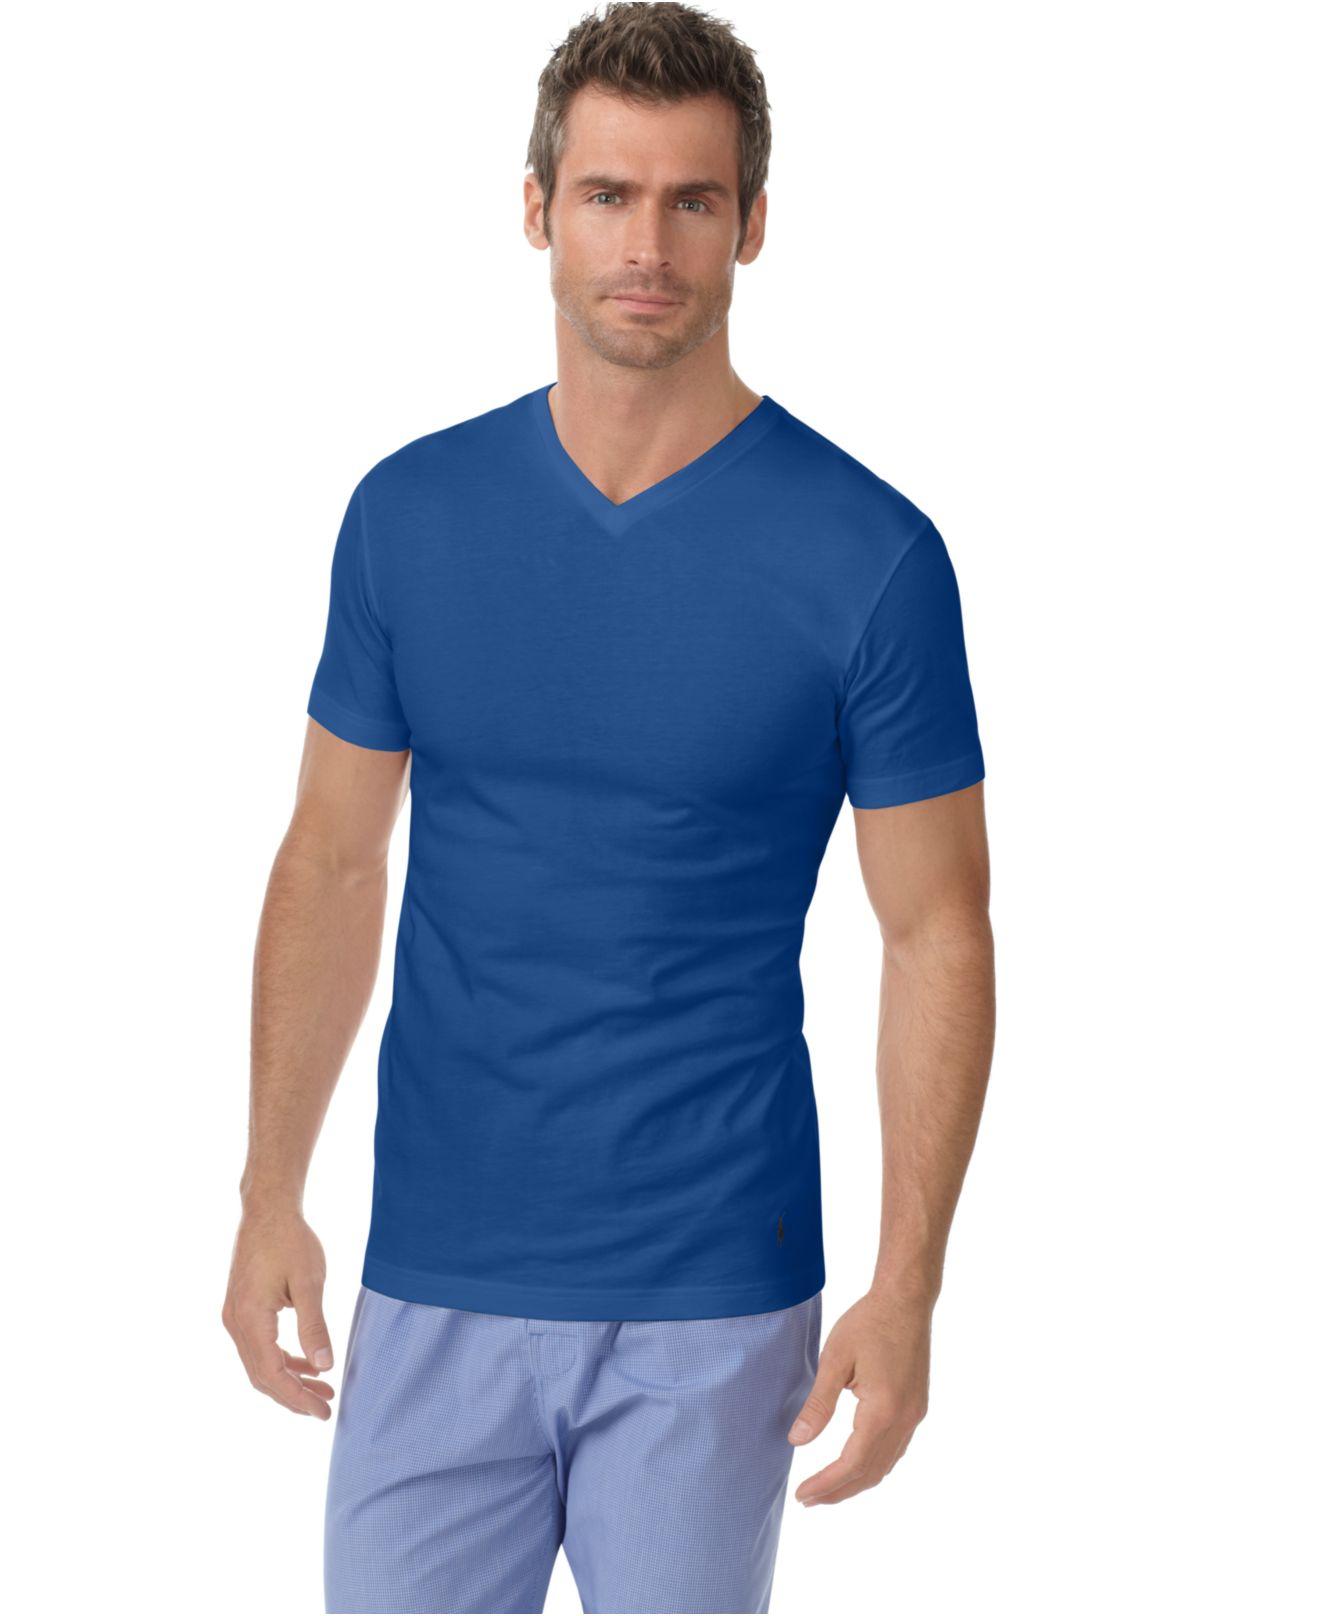 polo ralph lauren men 39 s slim fit classic cotton v neck t shirt 3 pack in blue for men blue. Black Bedroom Furniture Sets. Home Design Ideas